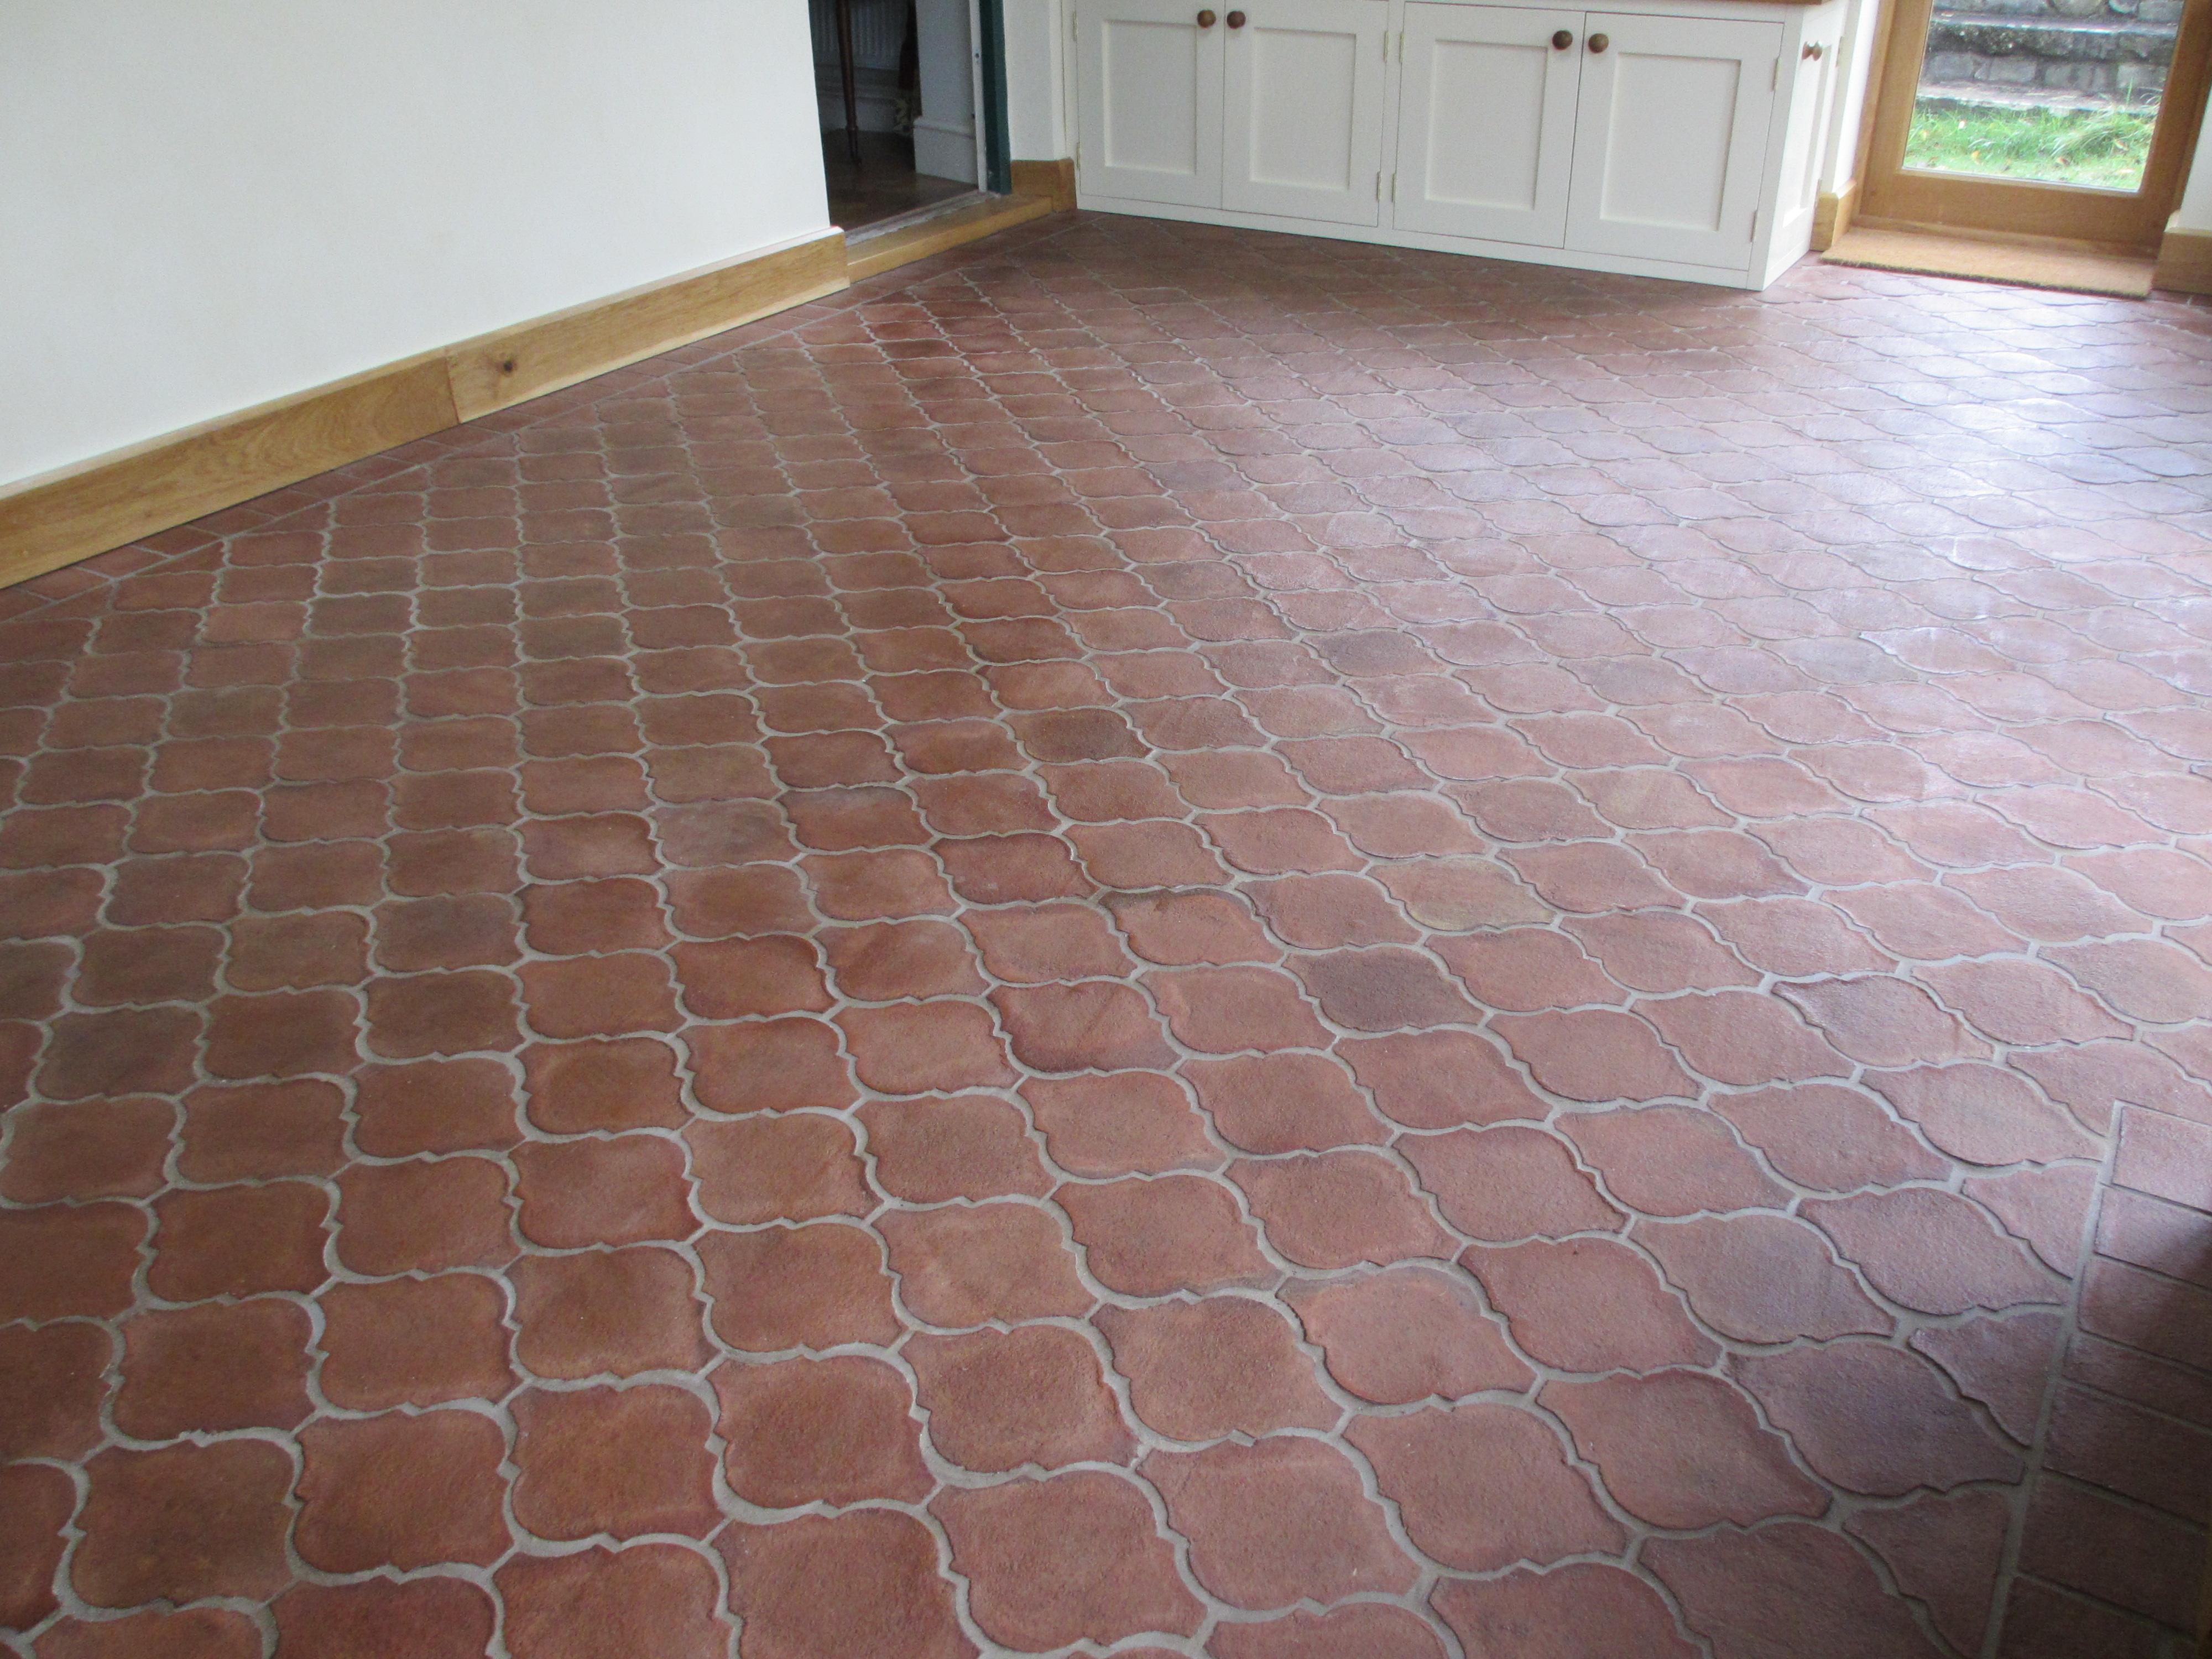 Terracotta outdoor floor tiles flooring ideas and inspiration terracotta tiles floor also outdoor dailygadgetfo Choice Image